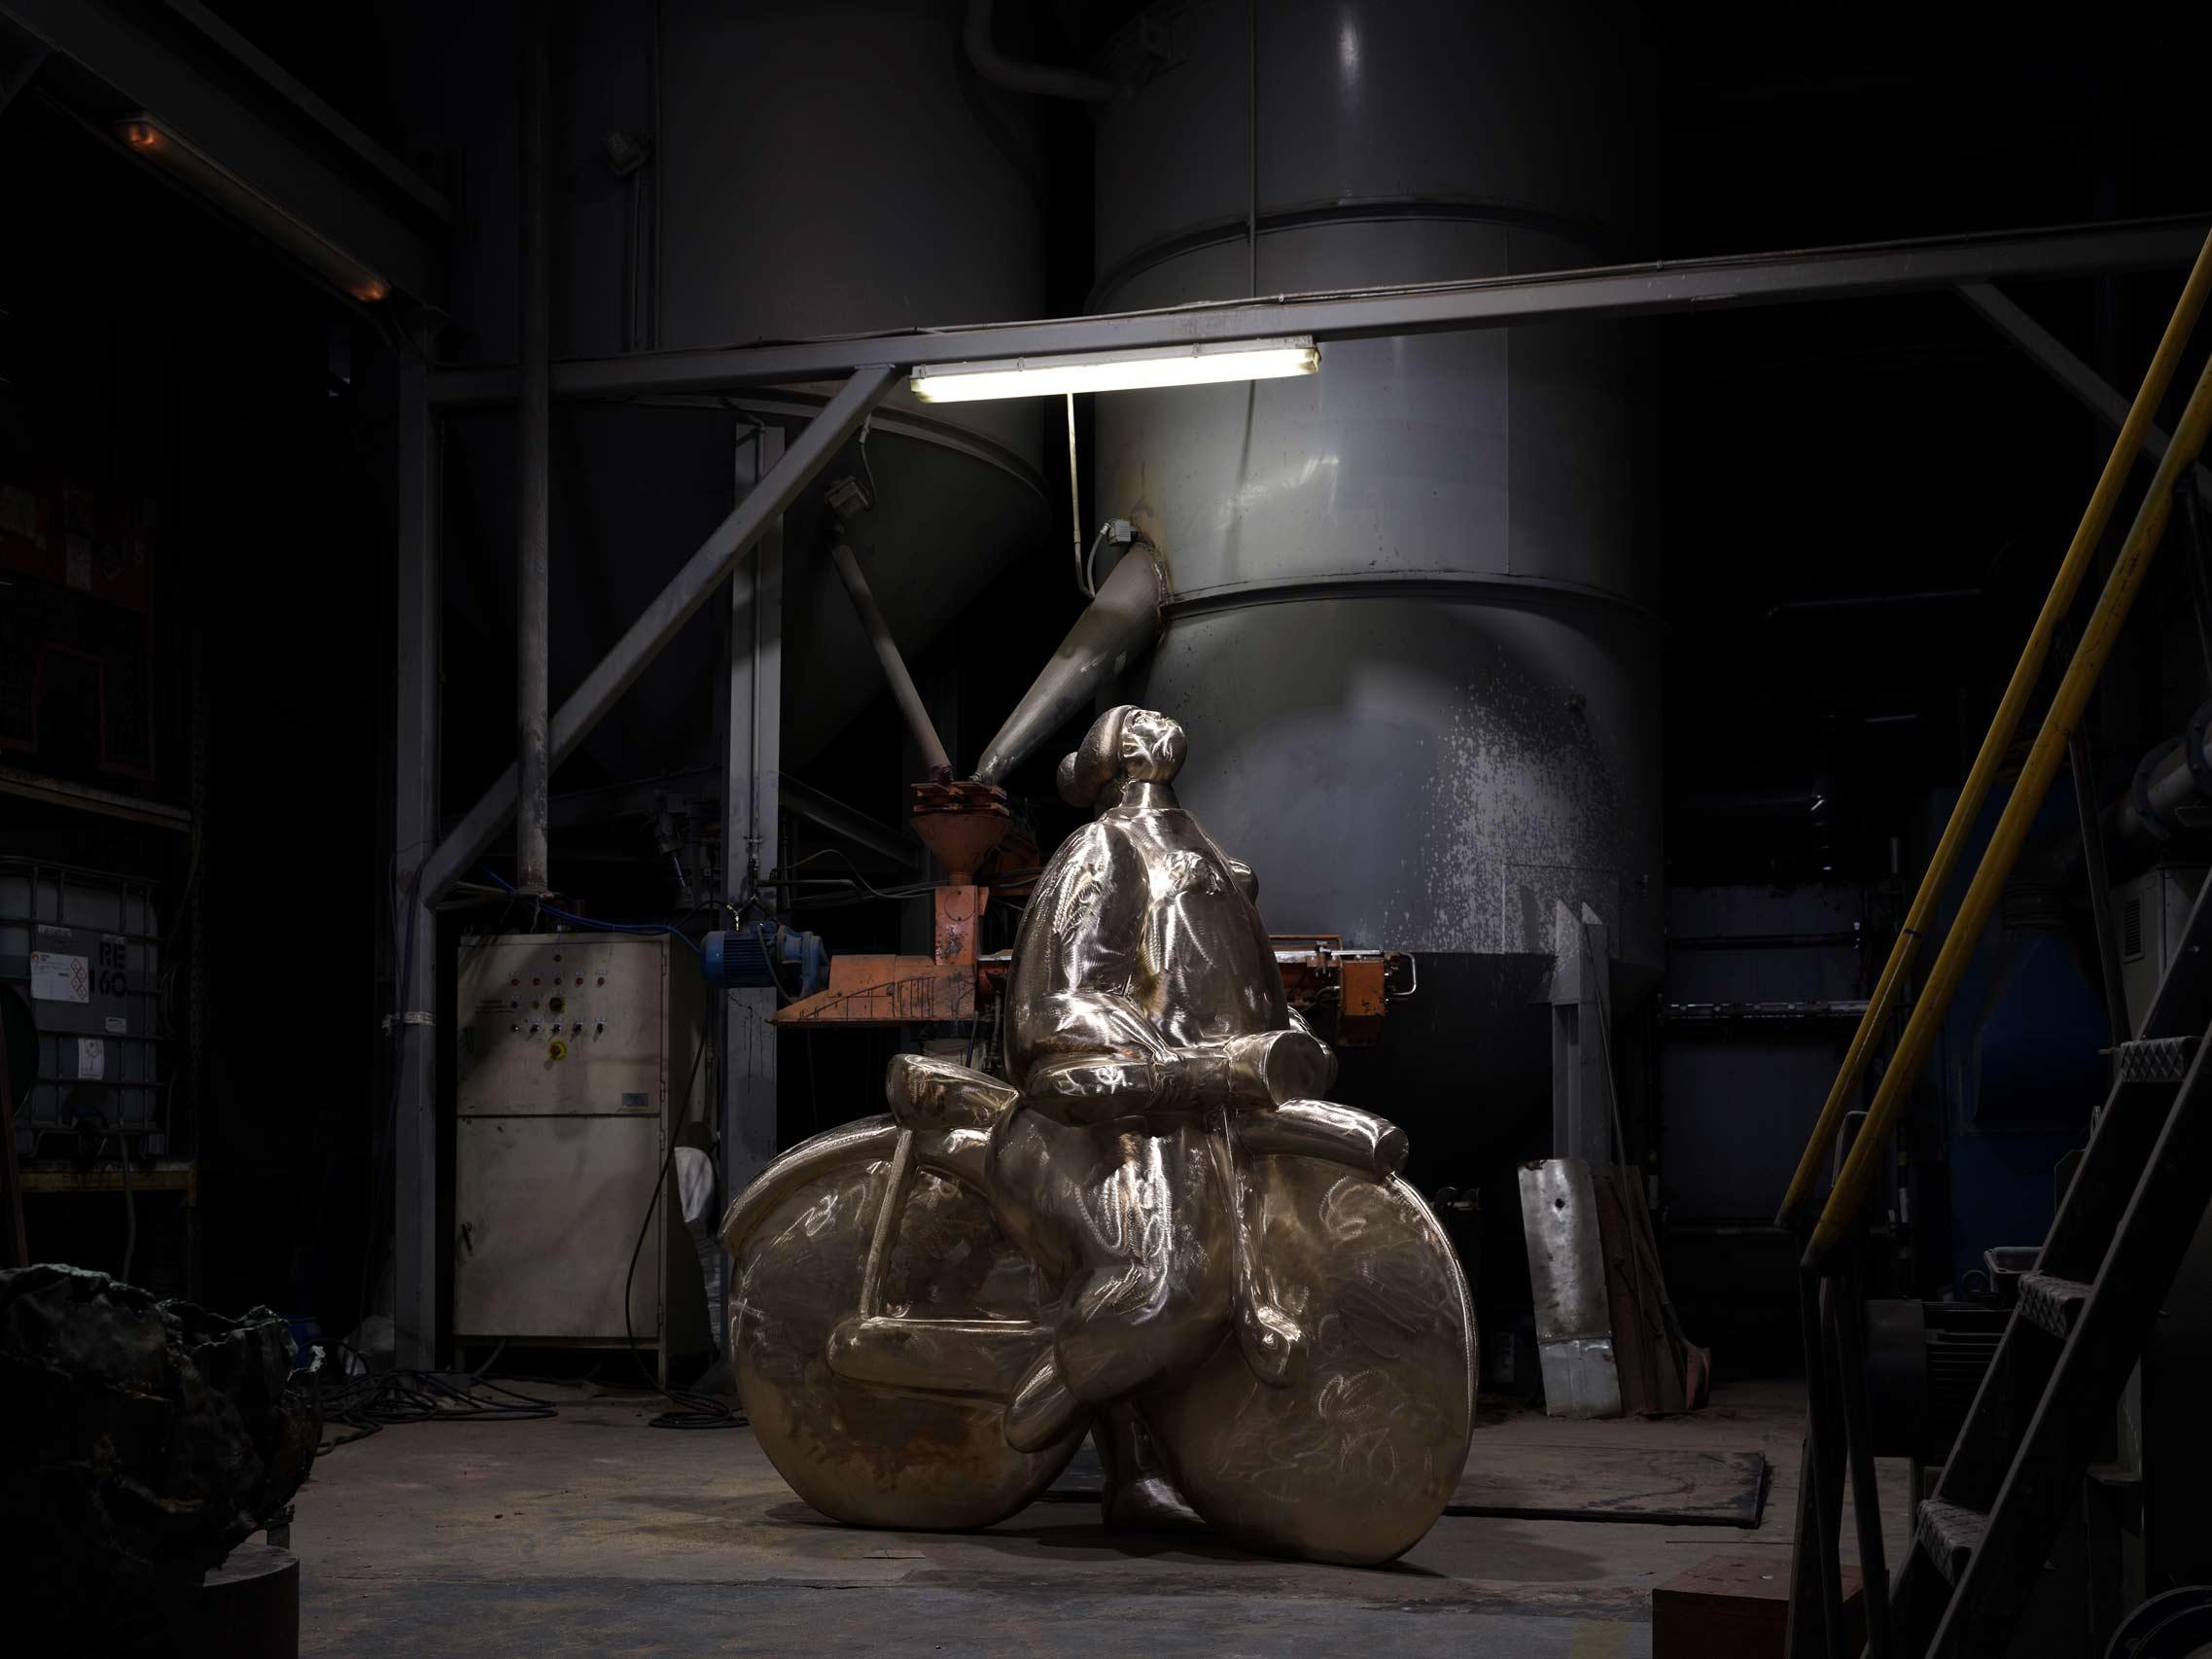 Ampliación en bronce realizada en Alfa Arte a partir de la escultura original  Menina C/ Bicicleta del escultor João Duarte para la ciudad de Setúbal en Portugal